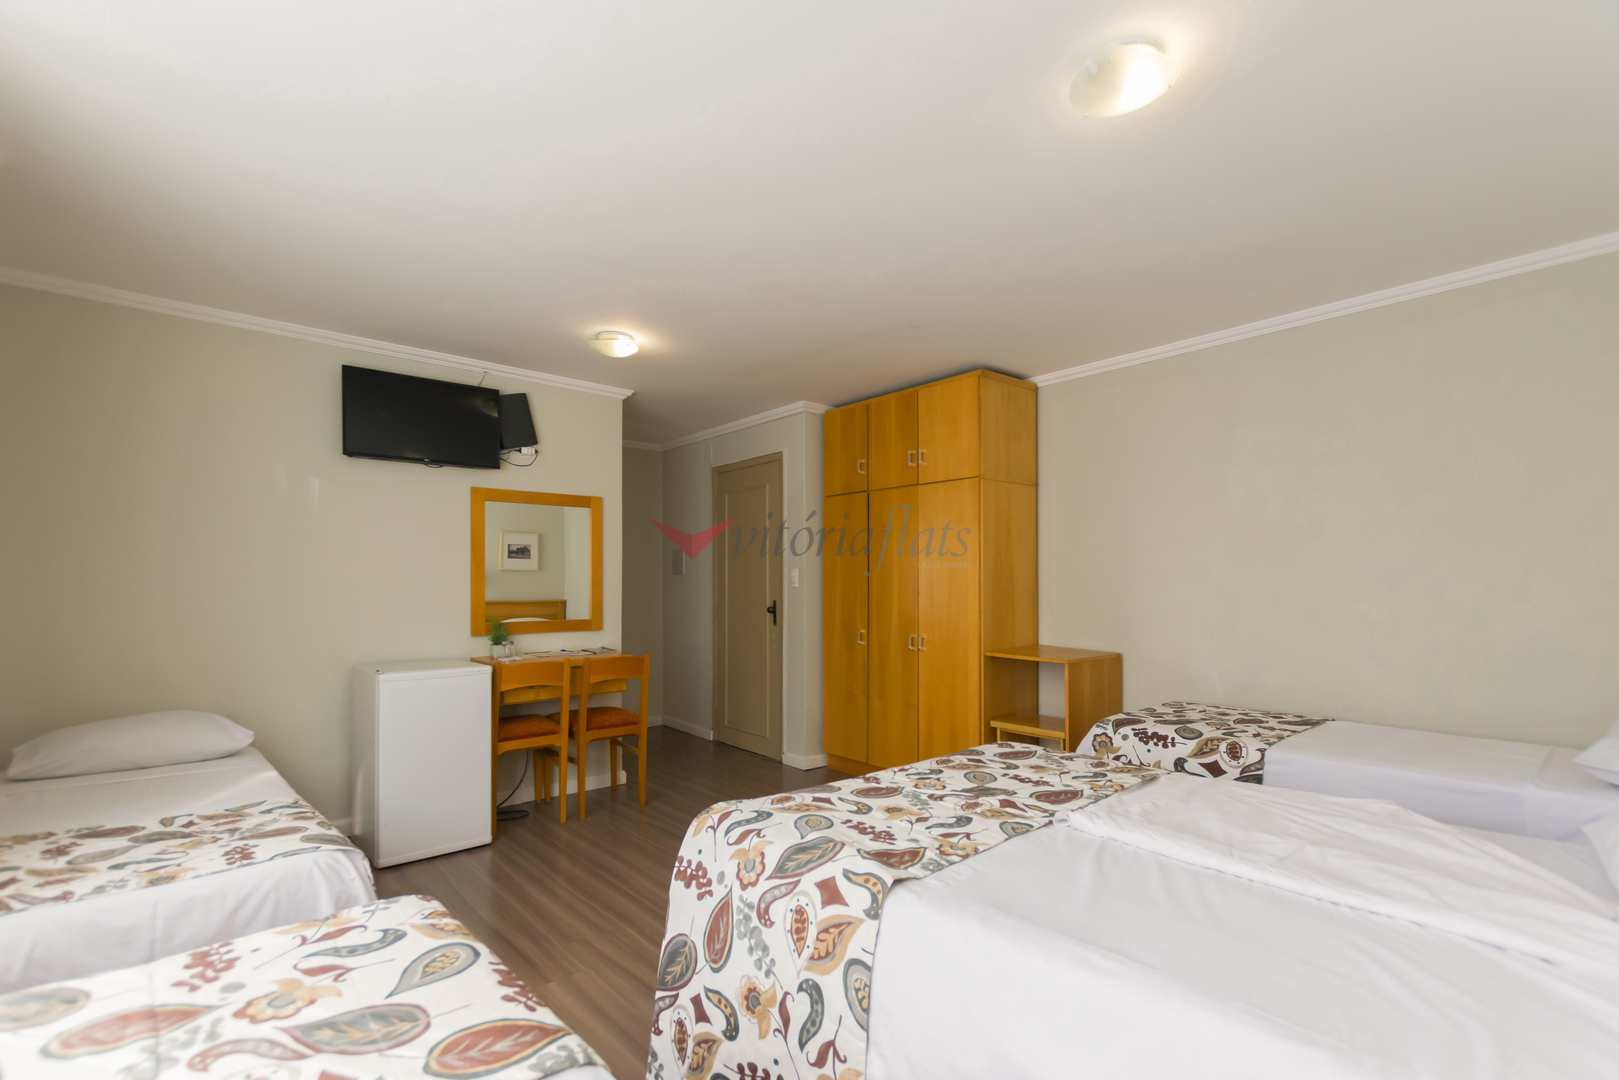 Flat com 1 dorm, Jardim Paulista, São Paulo, Cod: 64459799